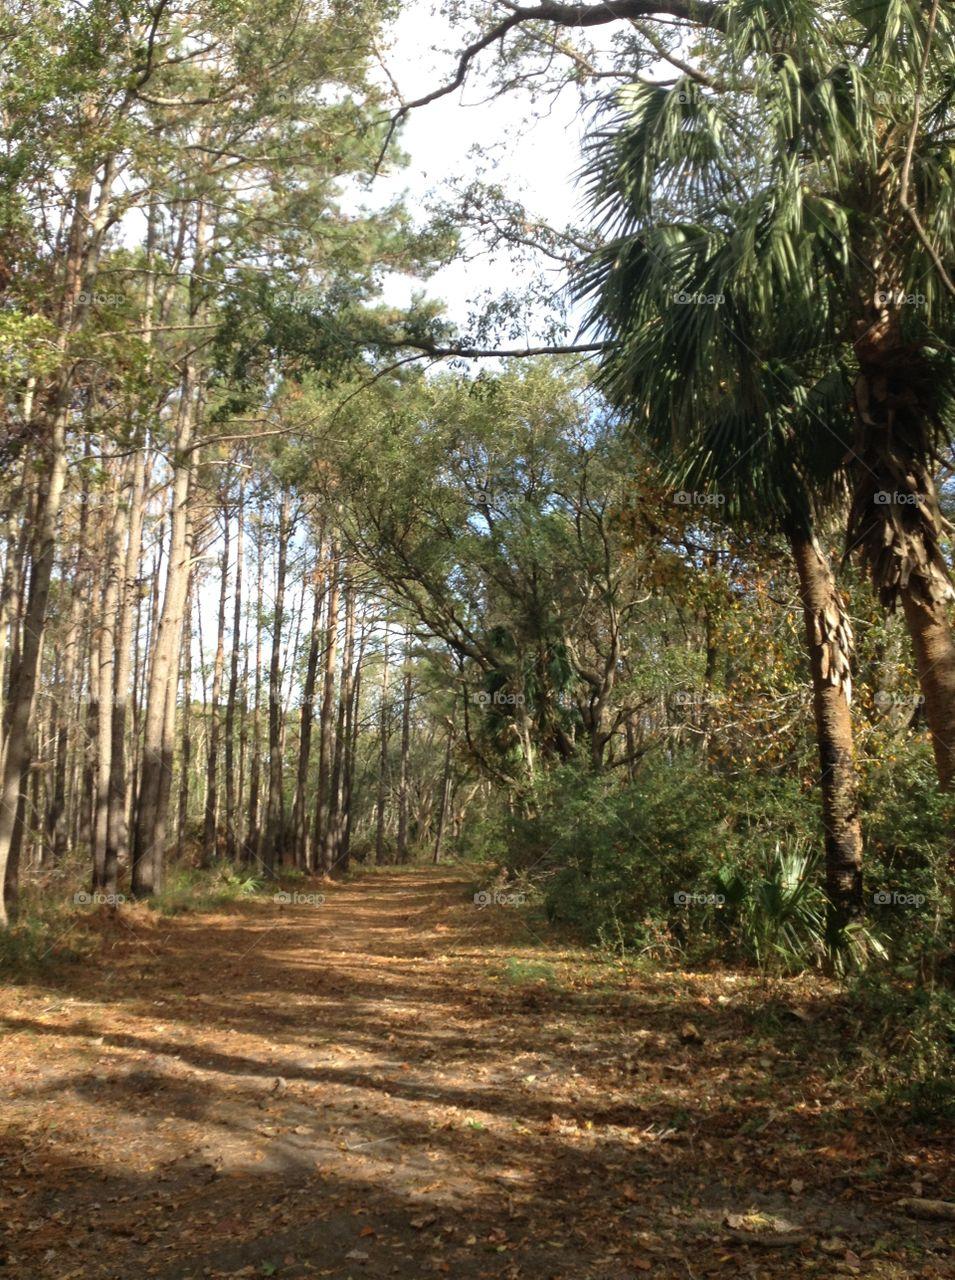 Pickney Wildlife refuge, South Carolina